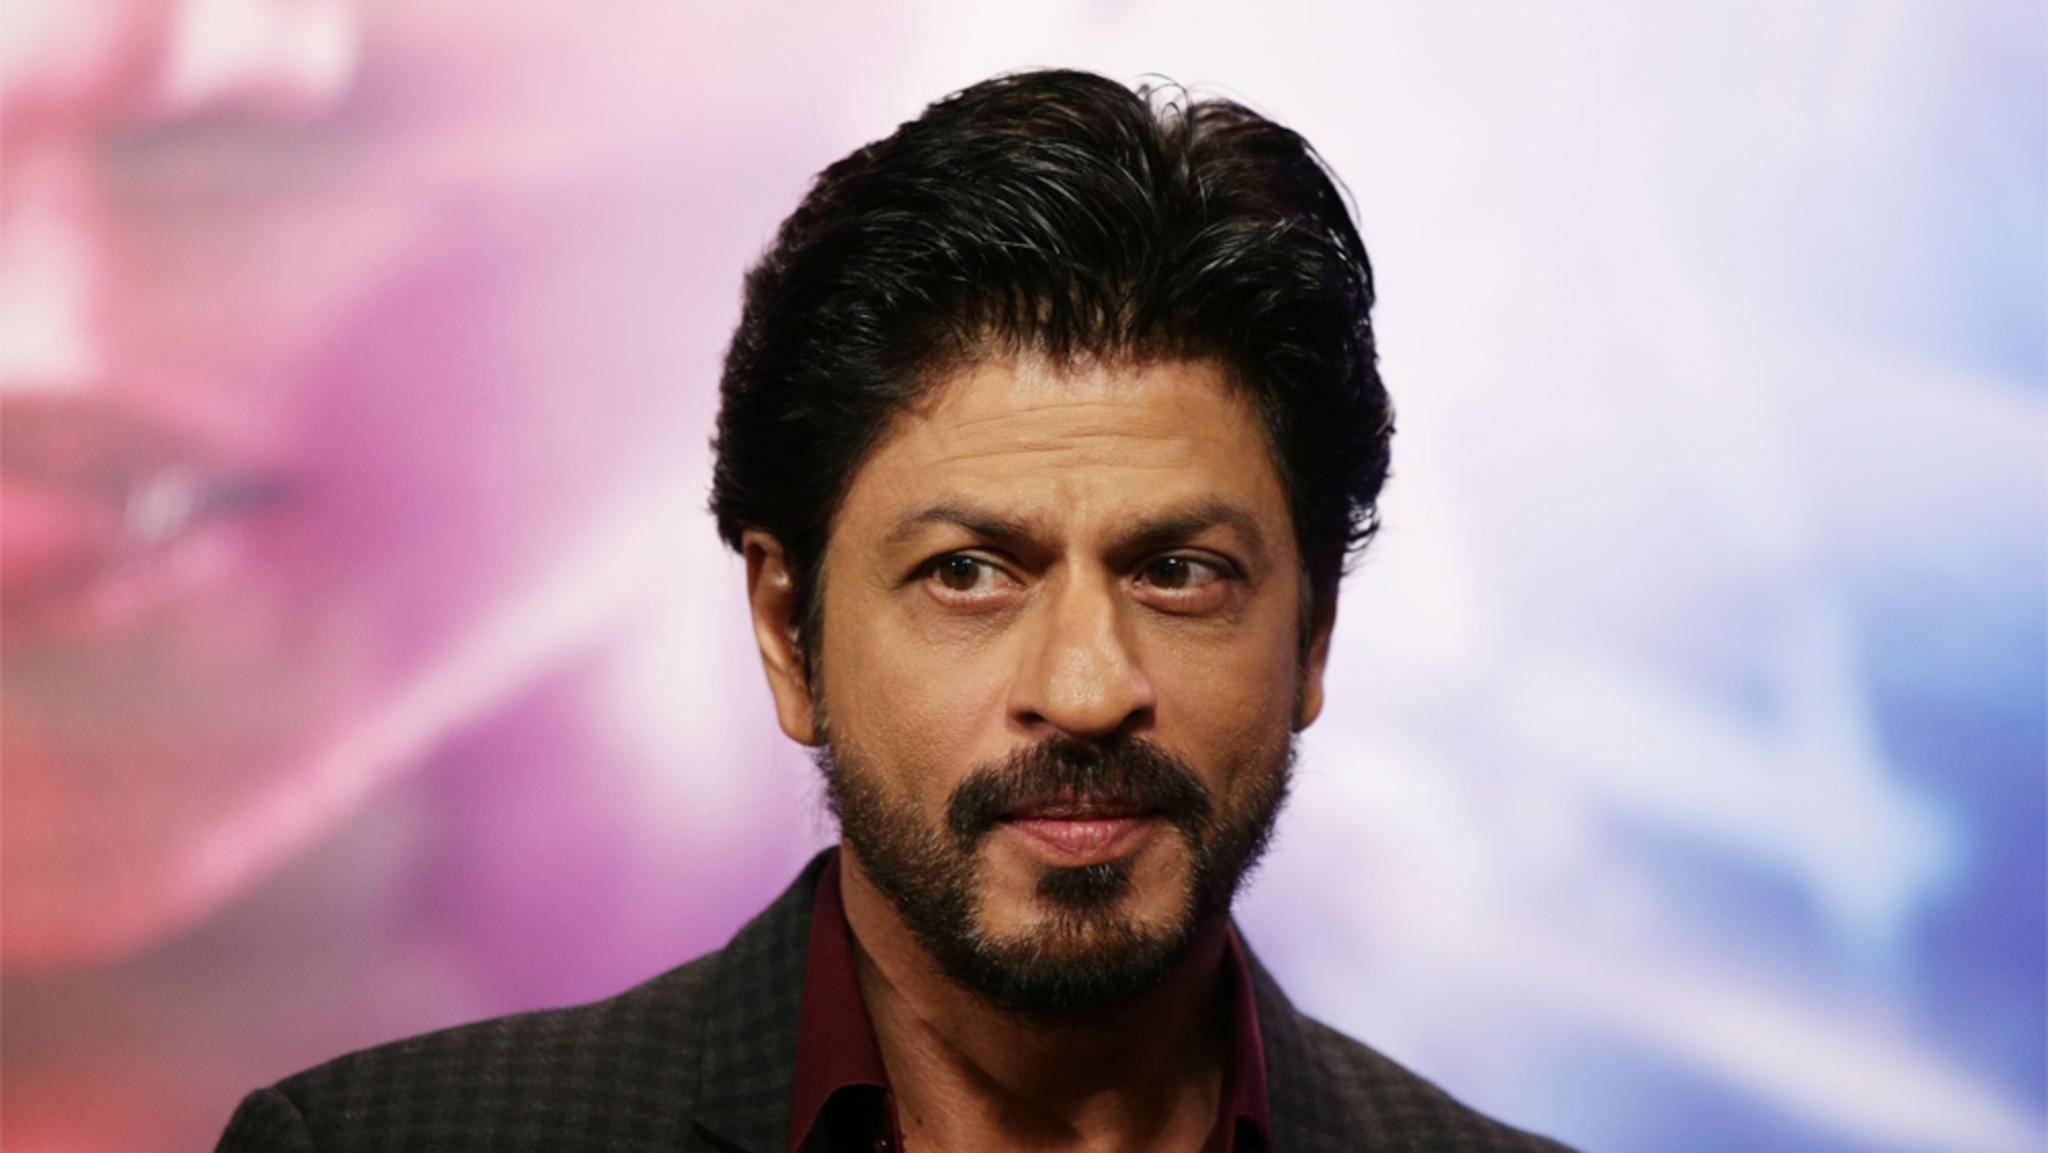 Shahrukh Khan Filme 9 Blockbuster Mit Dem Größten Bollywoodstar